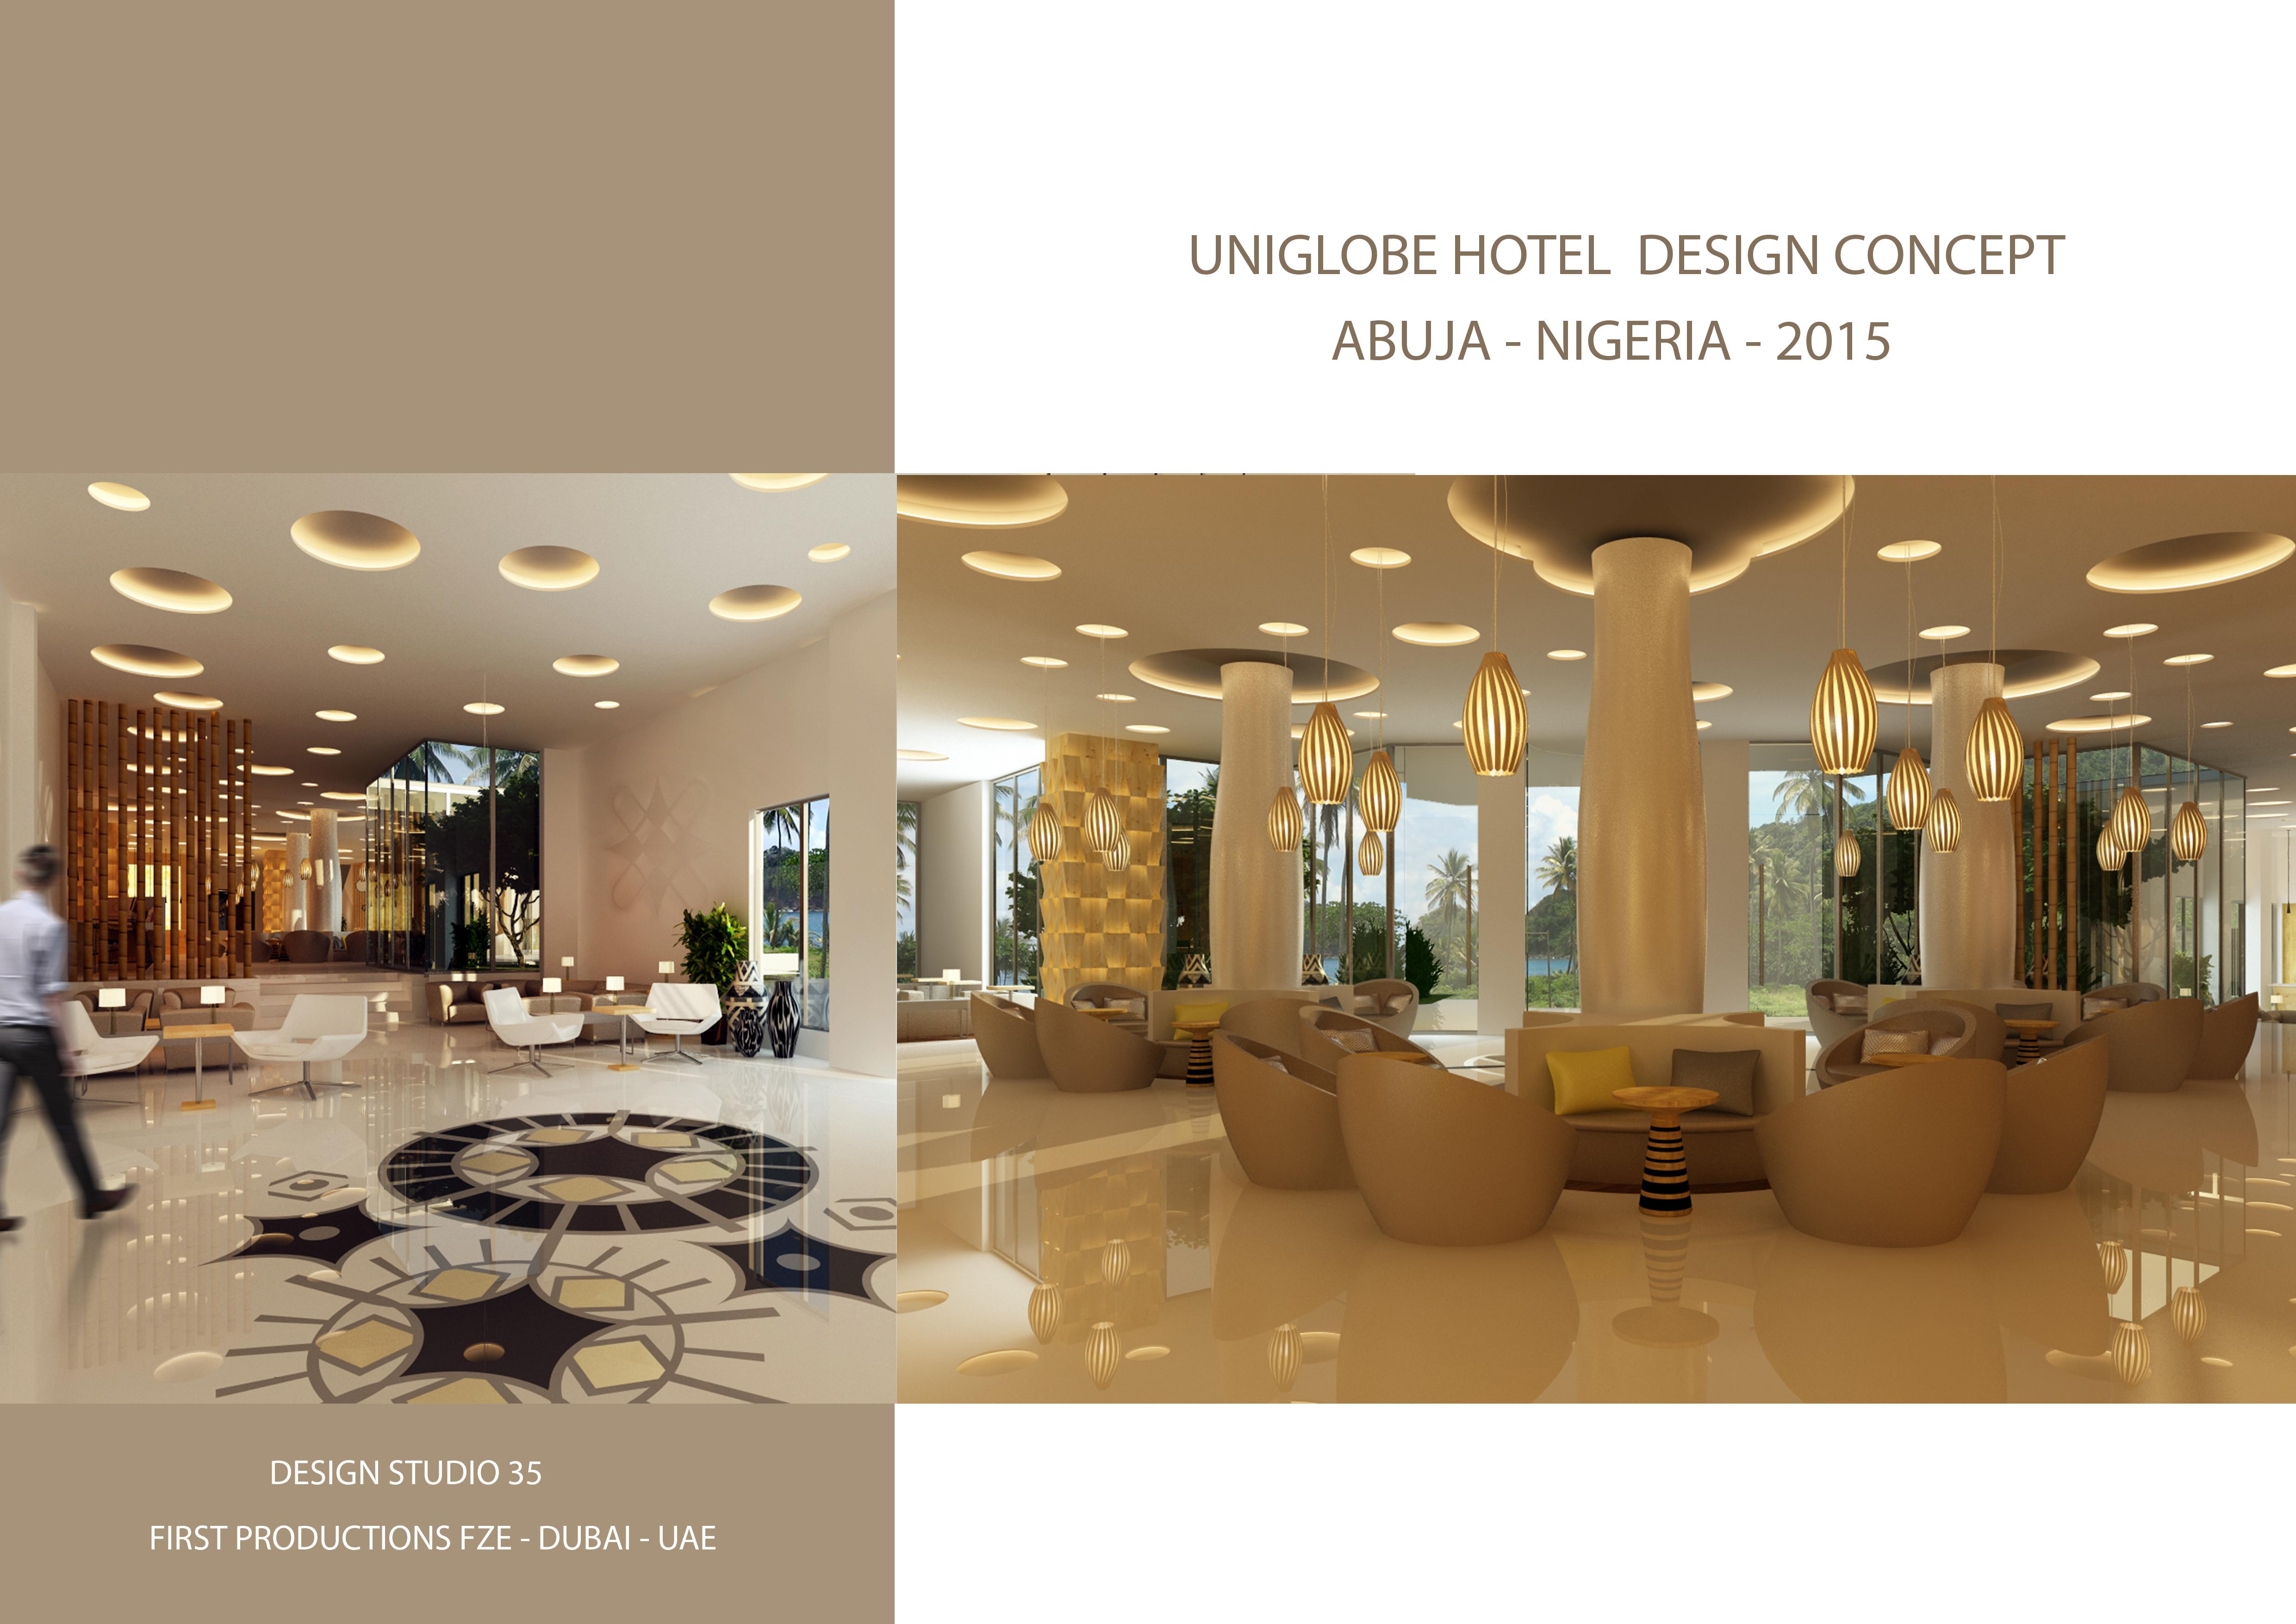 UNIGLOBE HOTEL